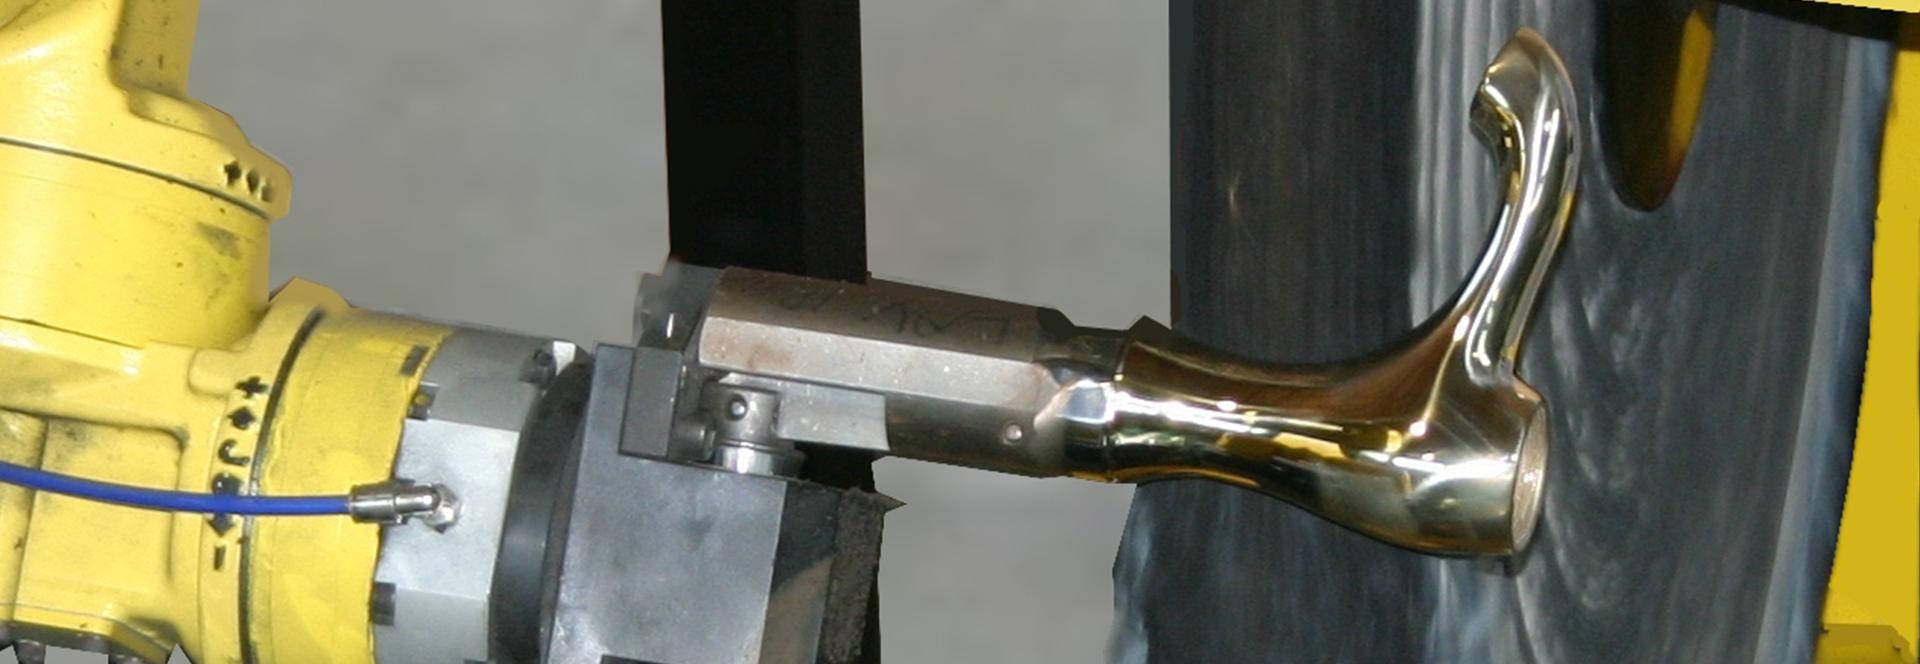 BMT Pulitura Metalli - Brillantatura Metalli